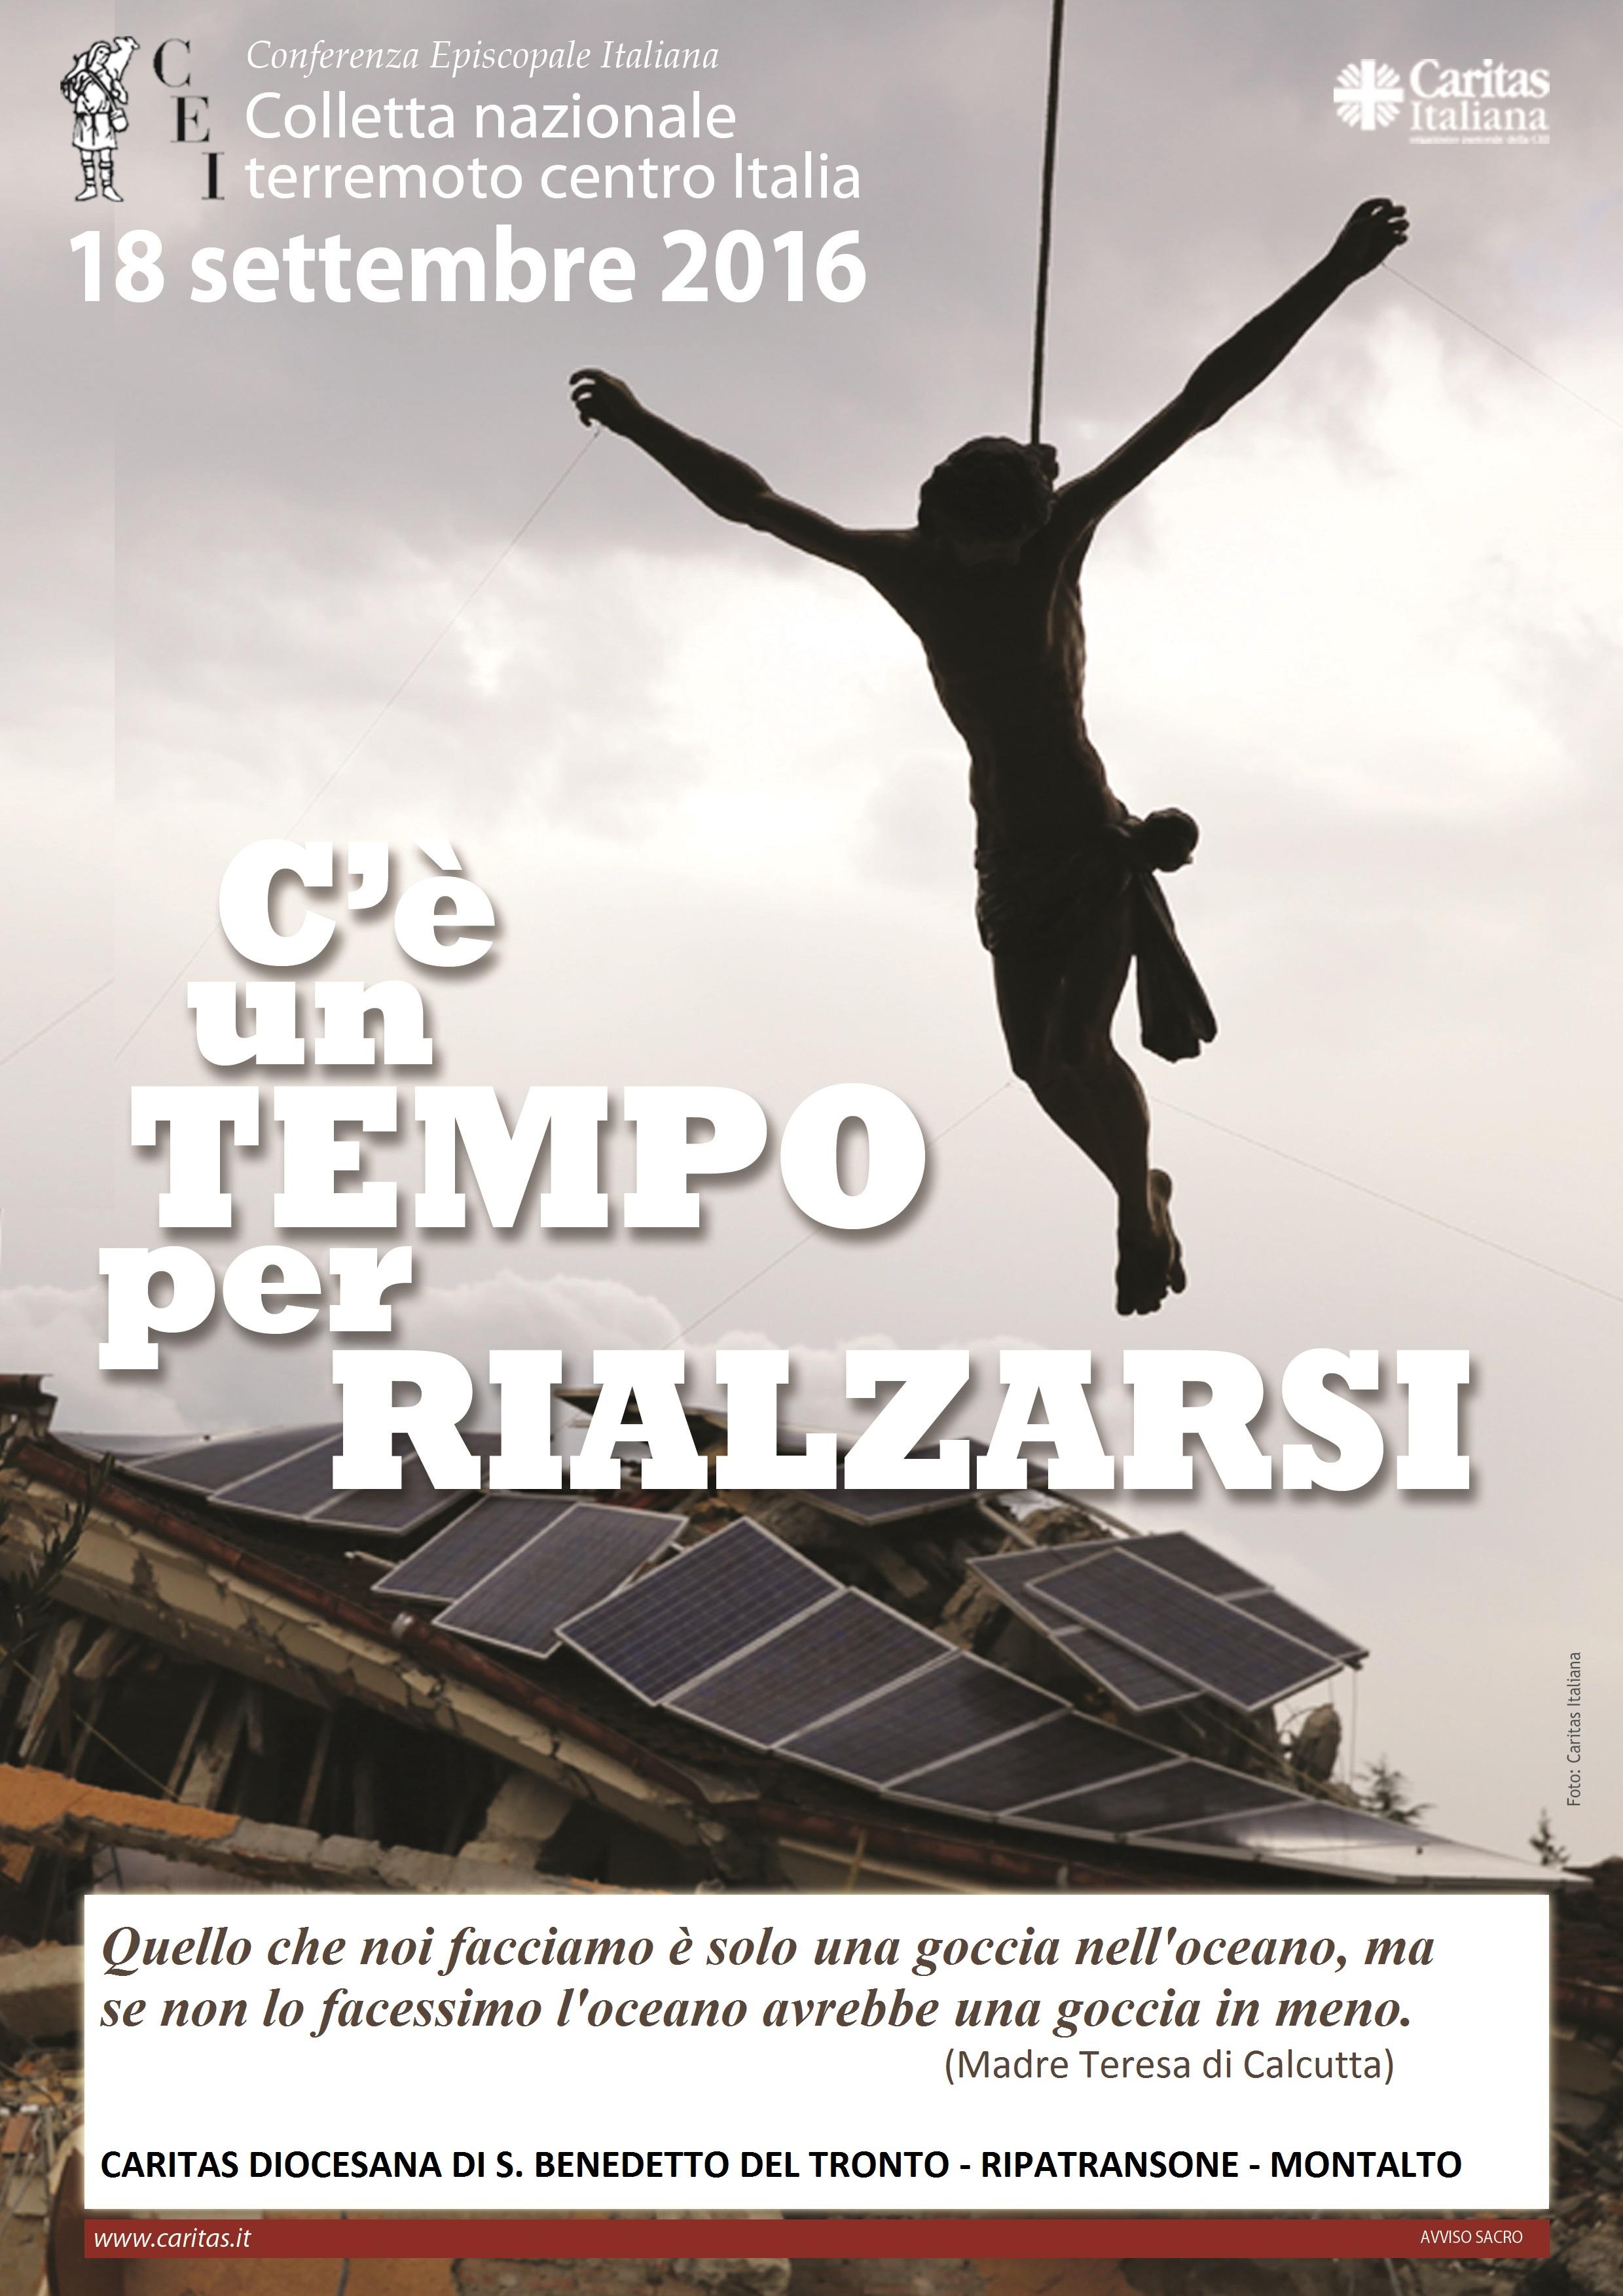 Locandina_colletta_terremoto2016_caritas_diocesane